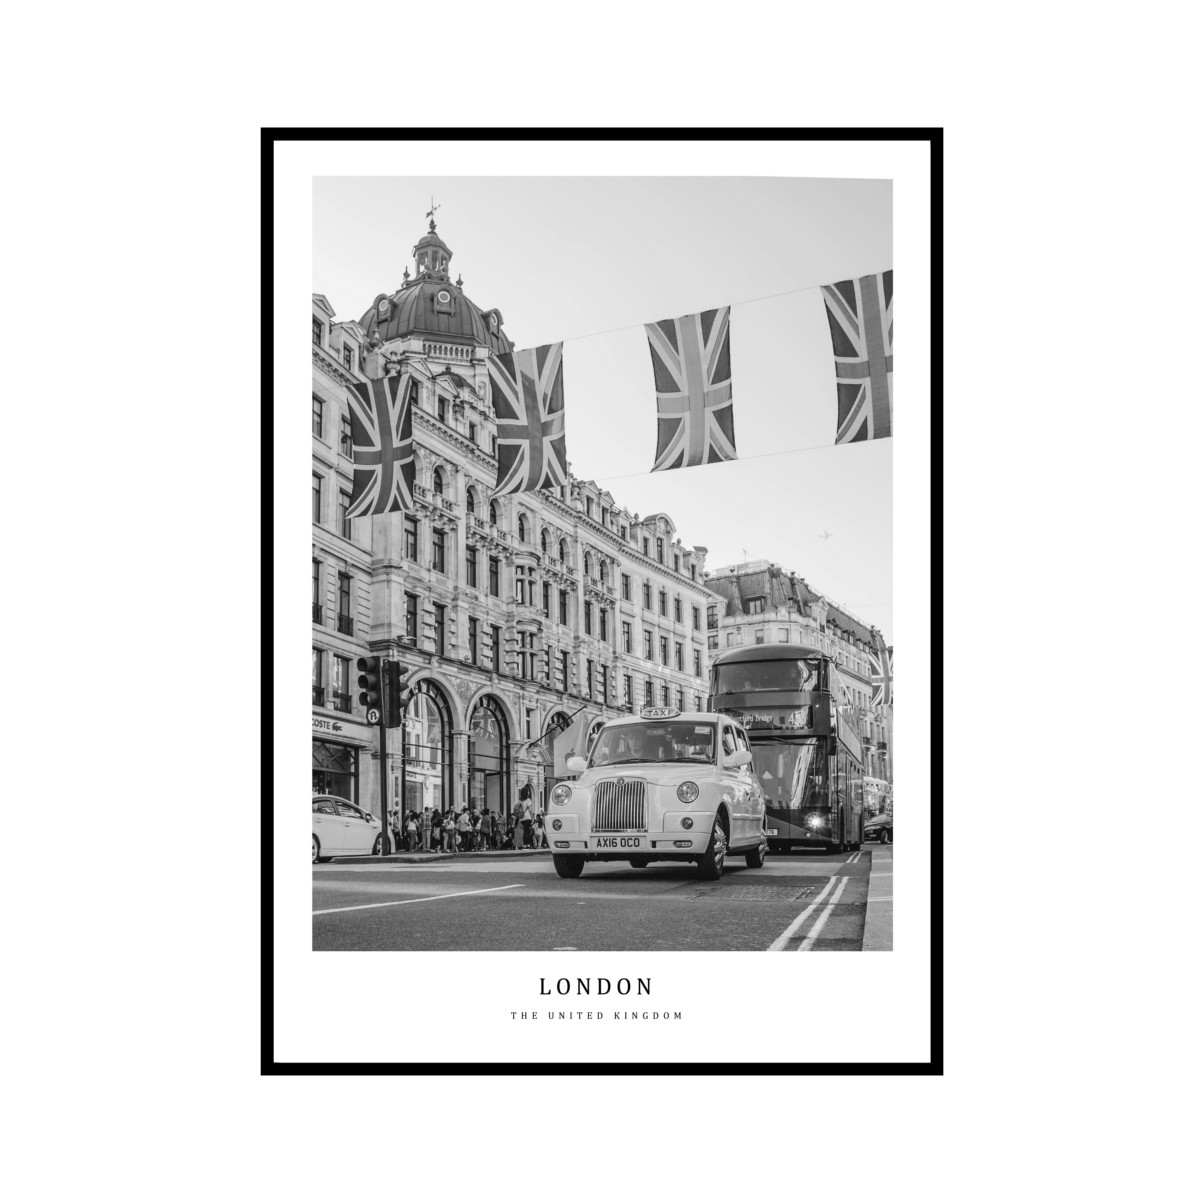 """LONDON"" UK - POSTER [SD-000600] A4サイズ ポスター単品"